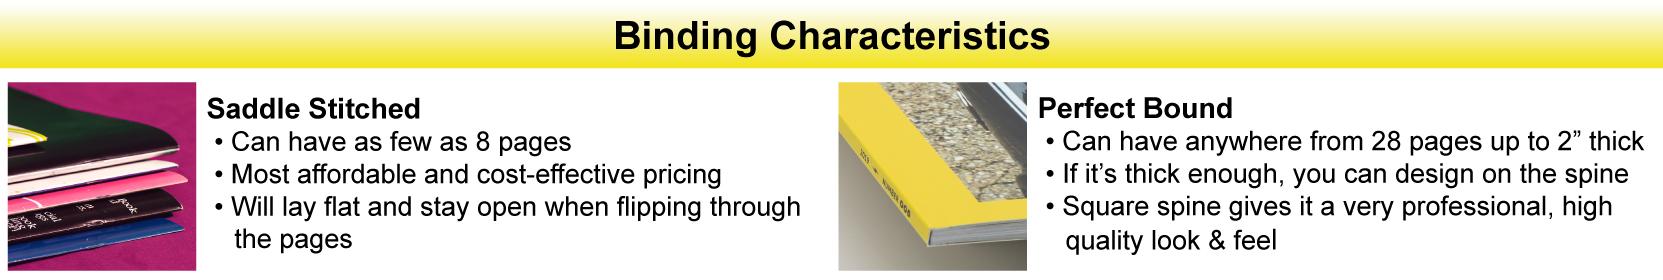 Book Binding Characteristics